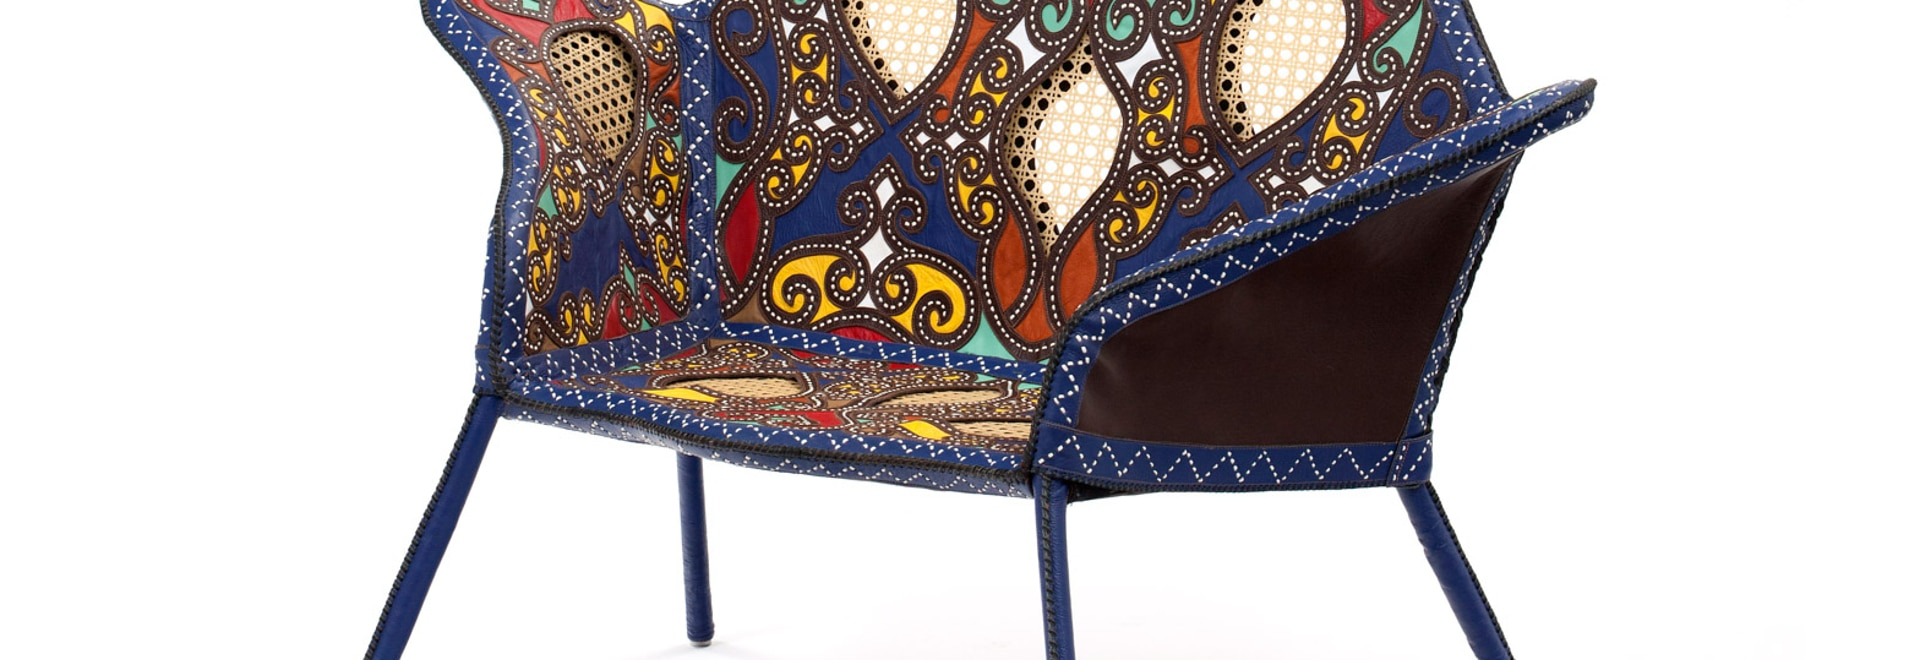 Campana Brothers base Cangaço furniture on Brazilian bandits' clothing